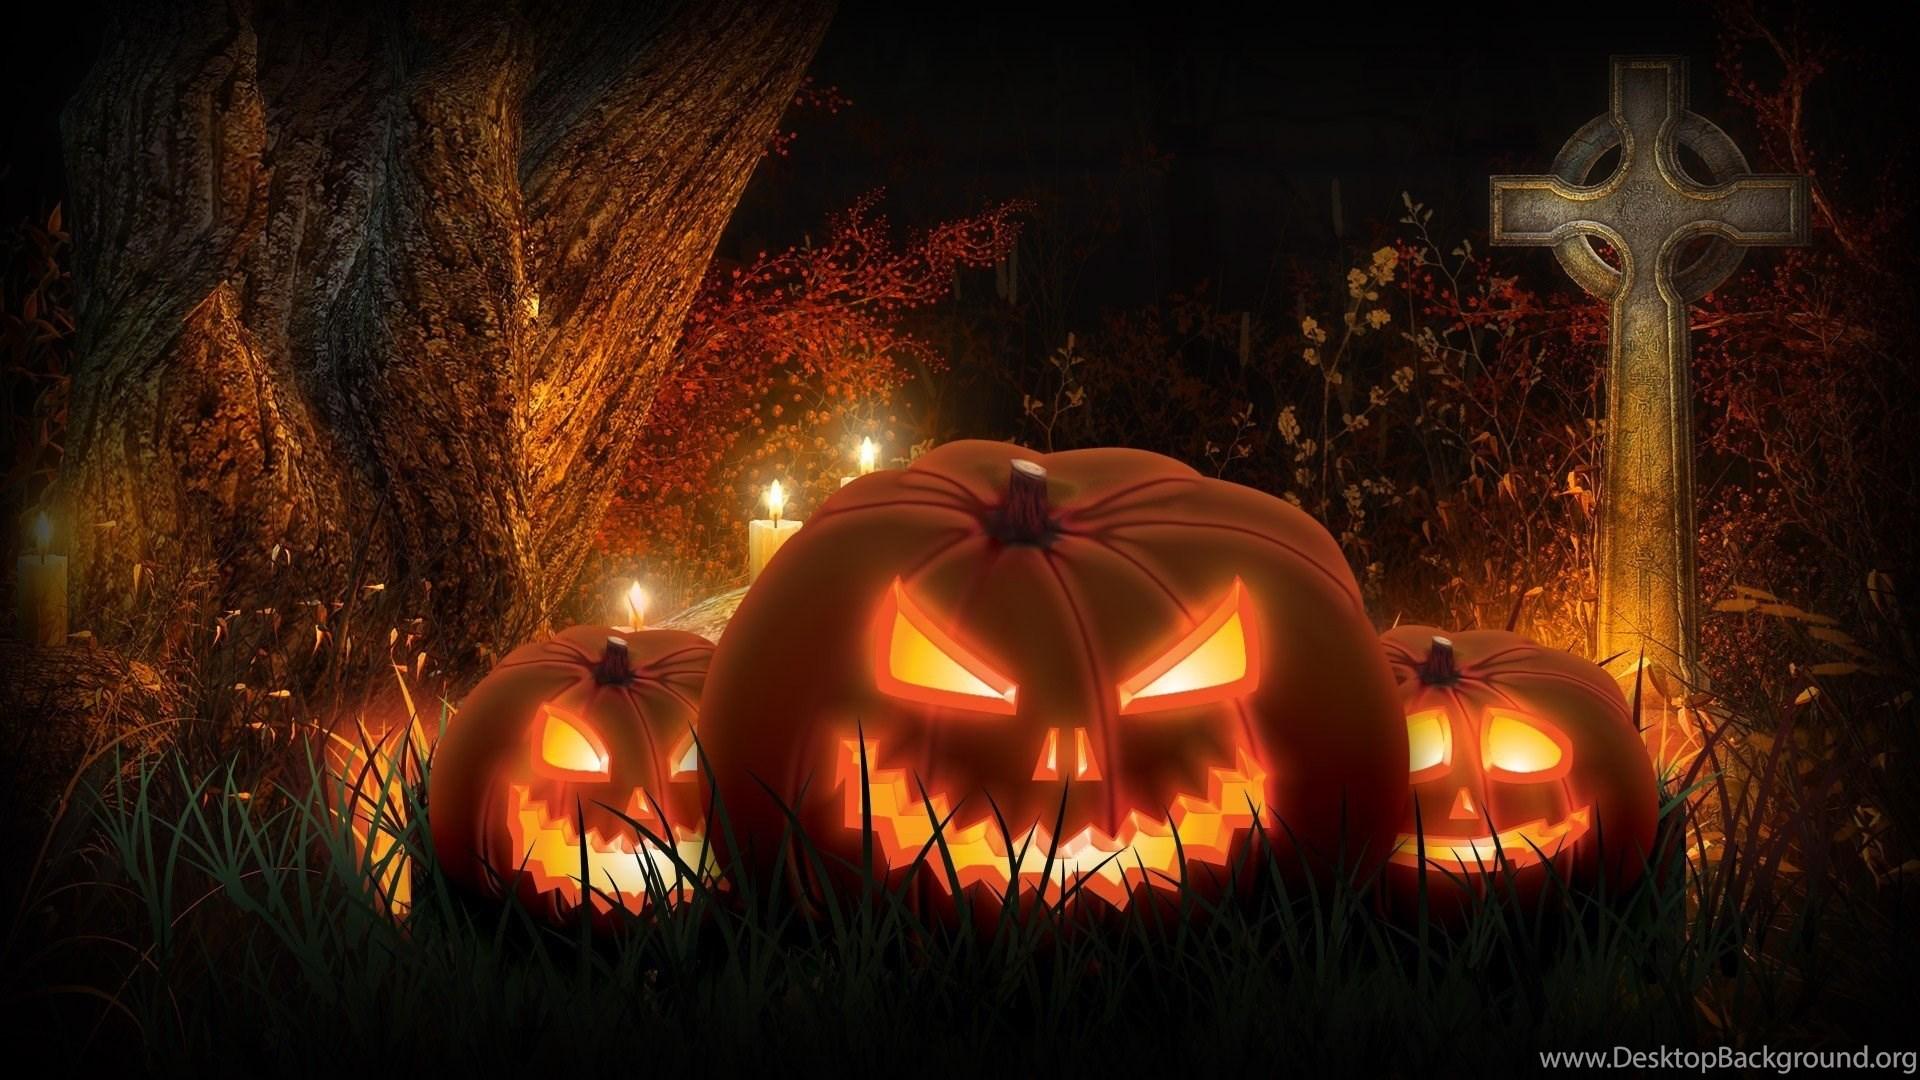 Jack O Lanterns In The Cemetery Halloween Pumpkin Night Desktop Background